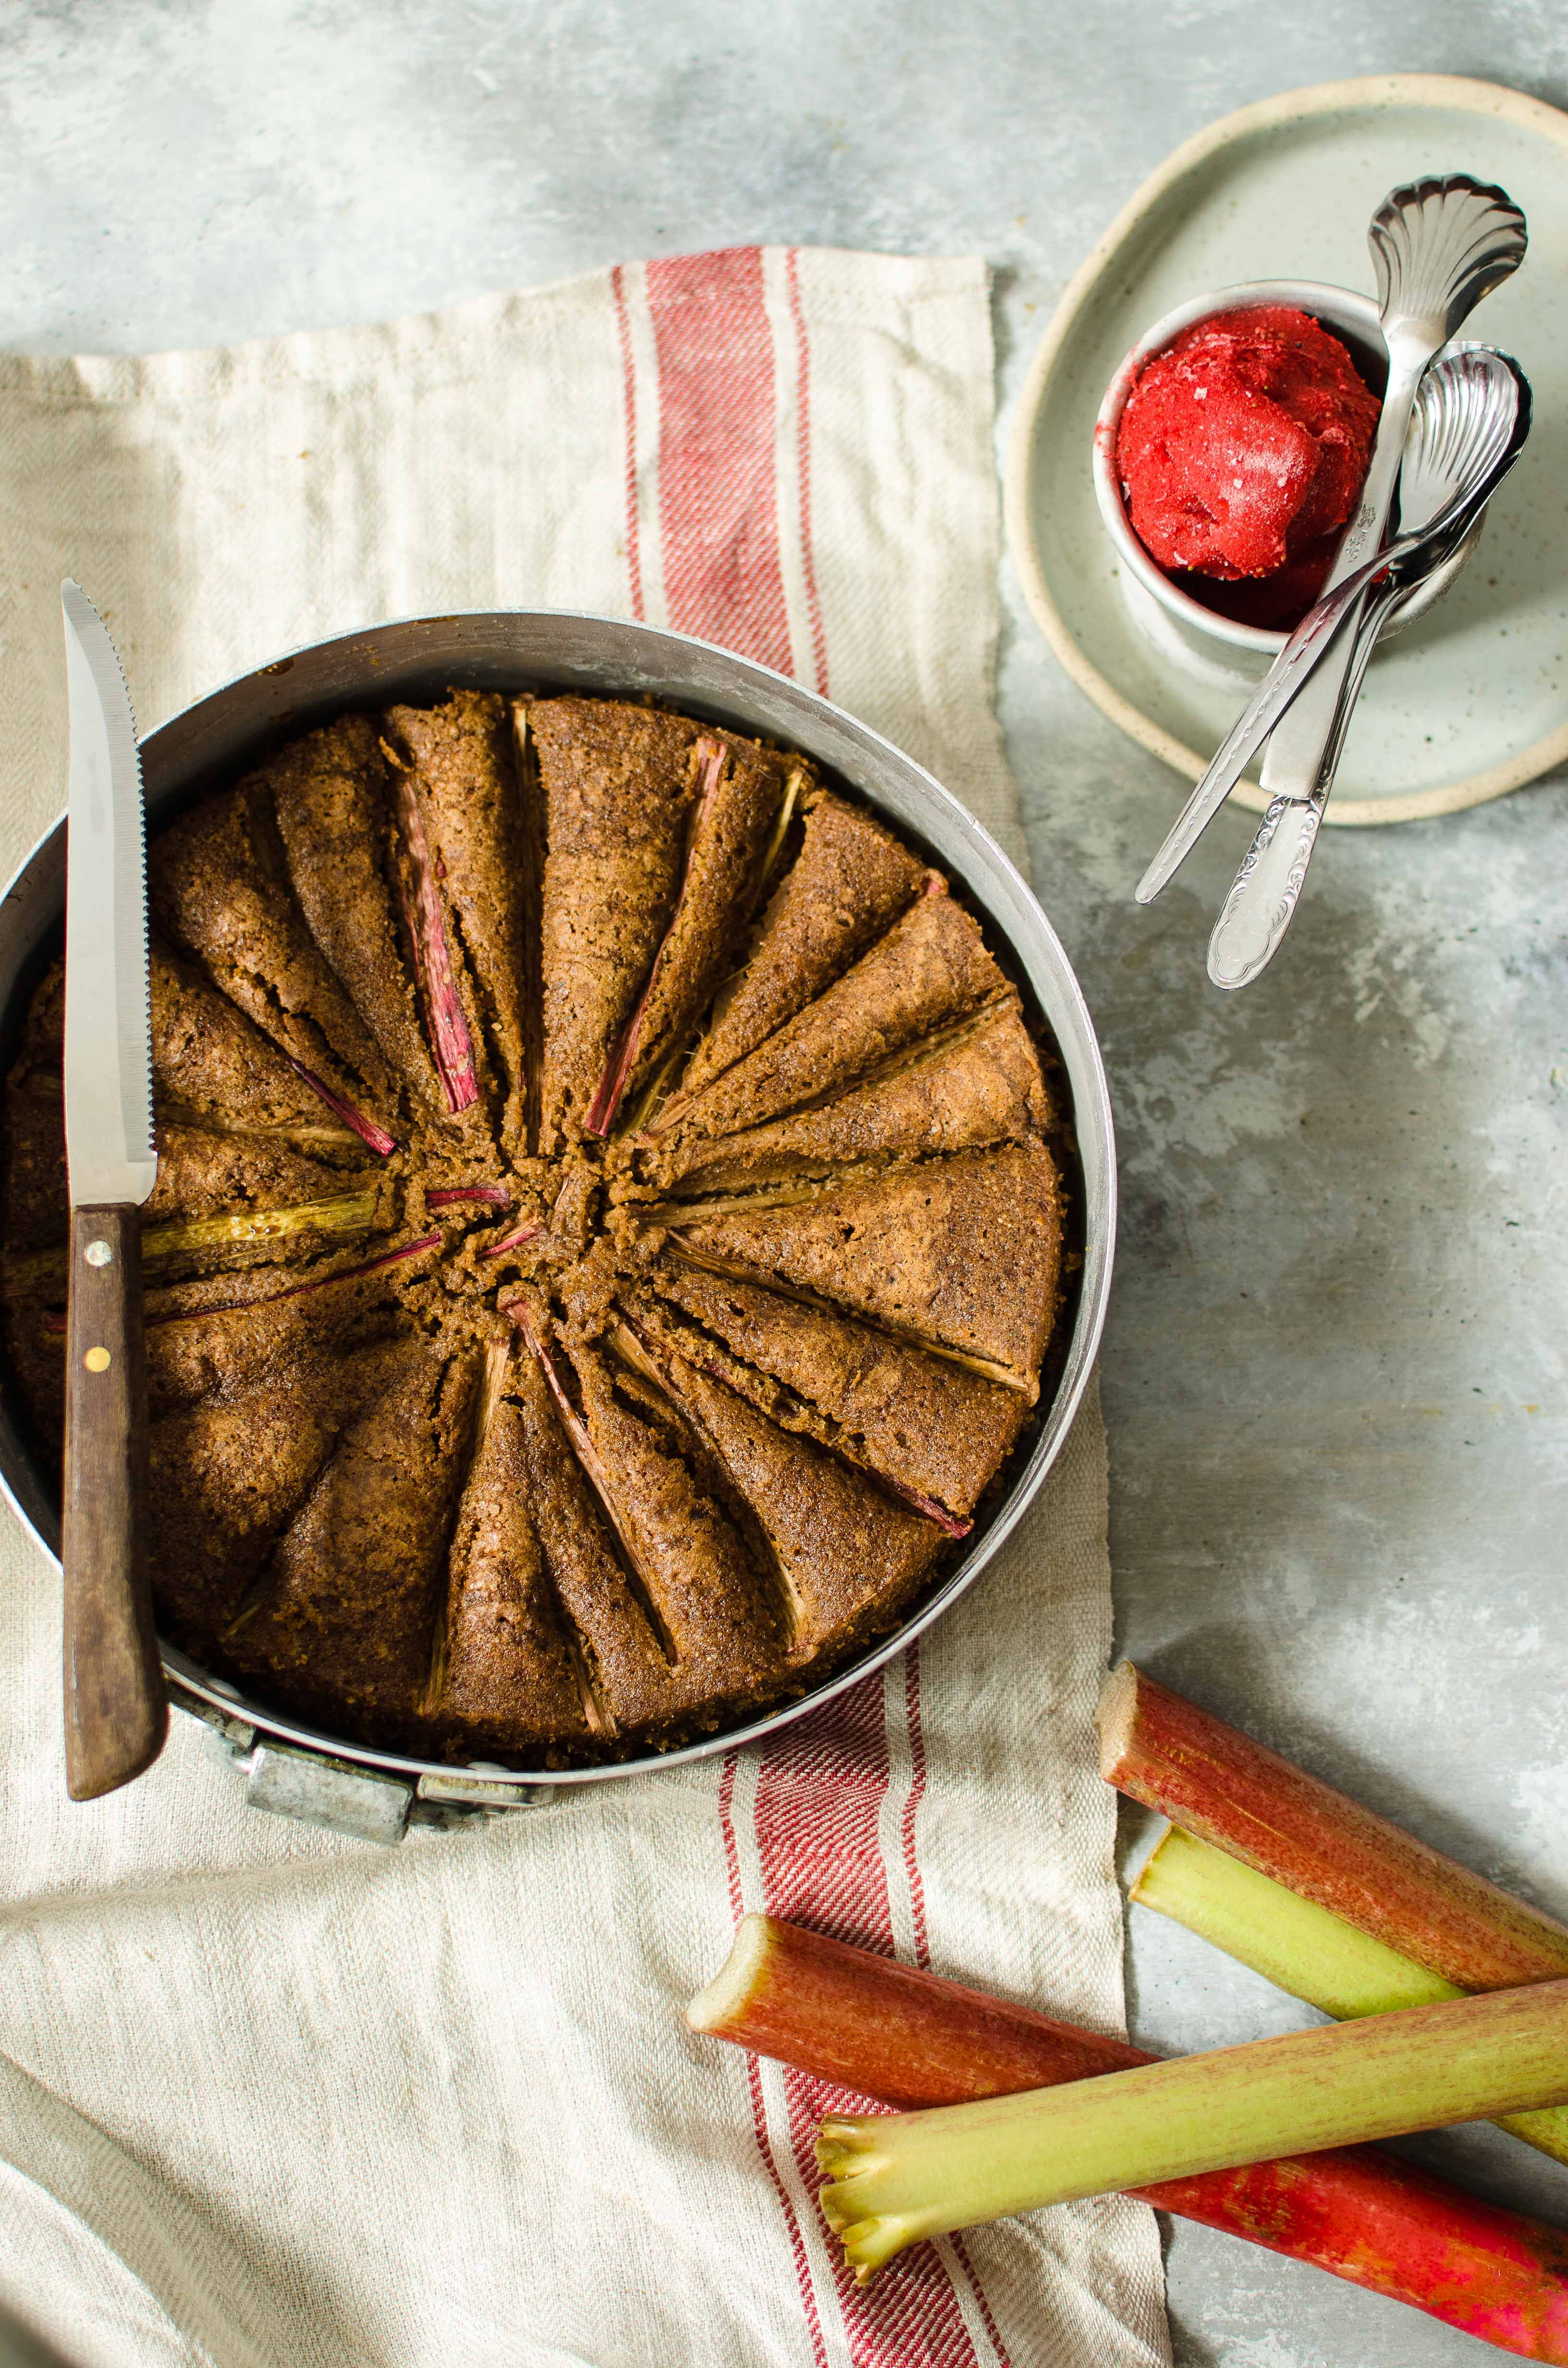 torta-al-rabarbaro Torta al rabarbaro